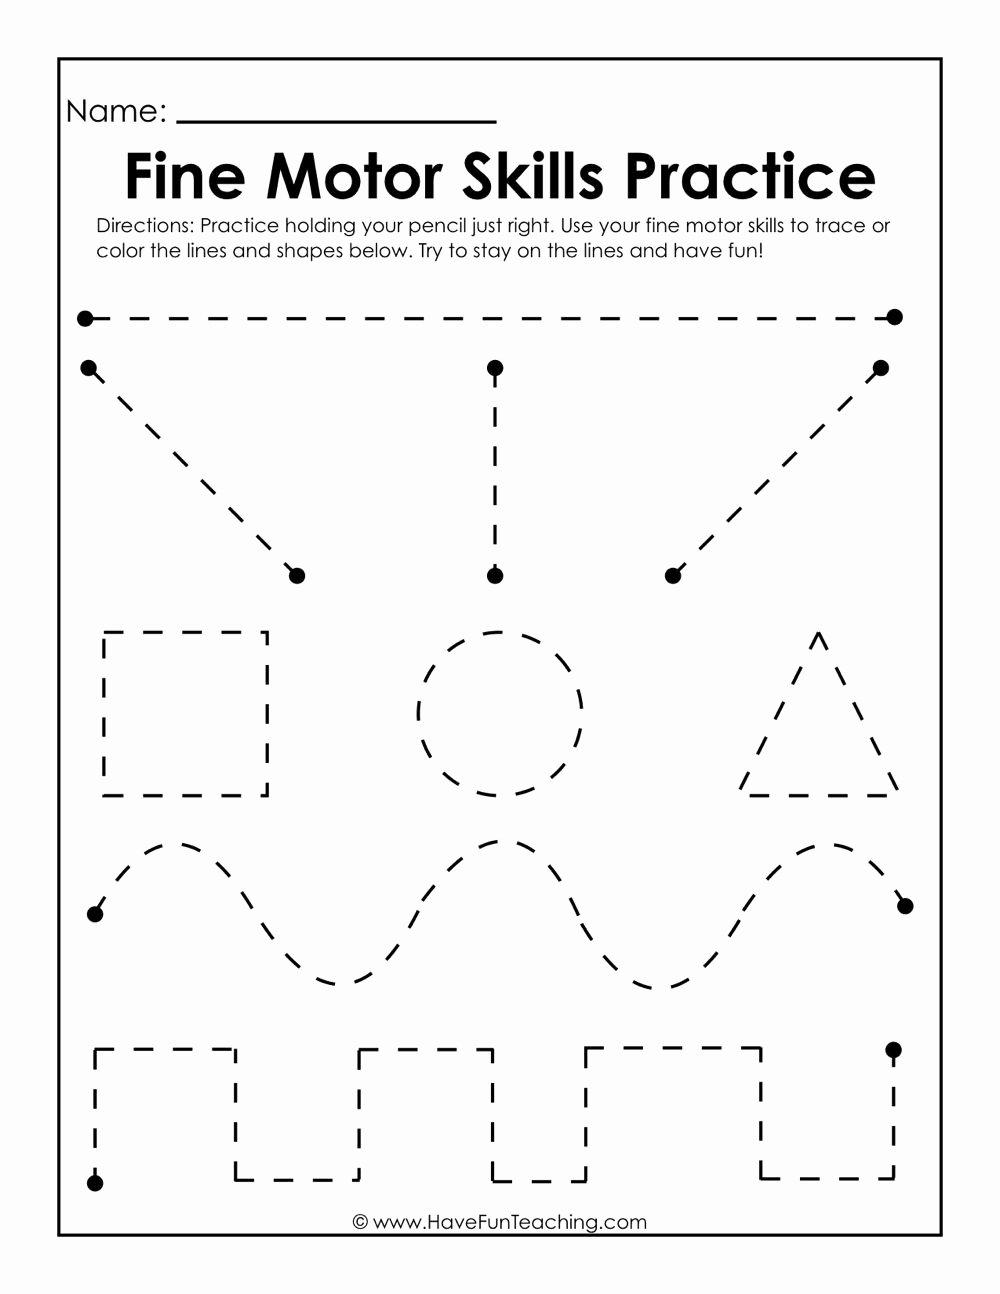 Fine Motor Worksheets for Preschoolers Printable Fine Motor Skills Practice Worksheet